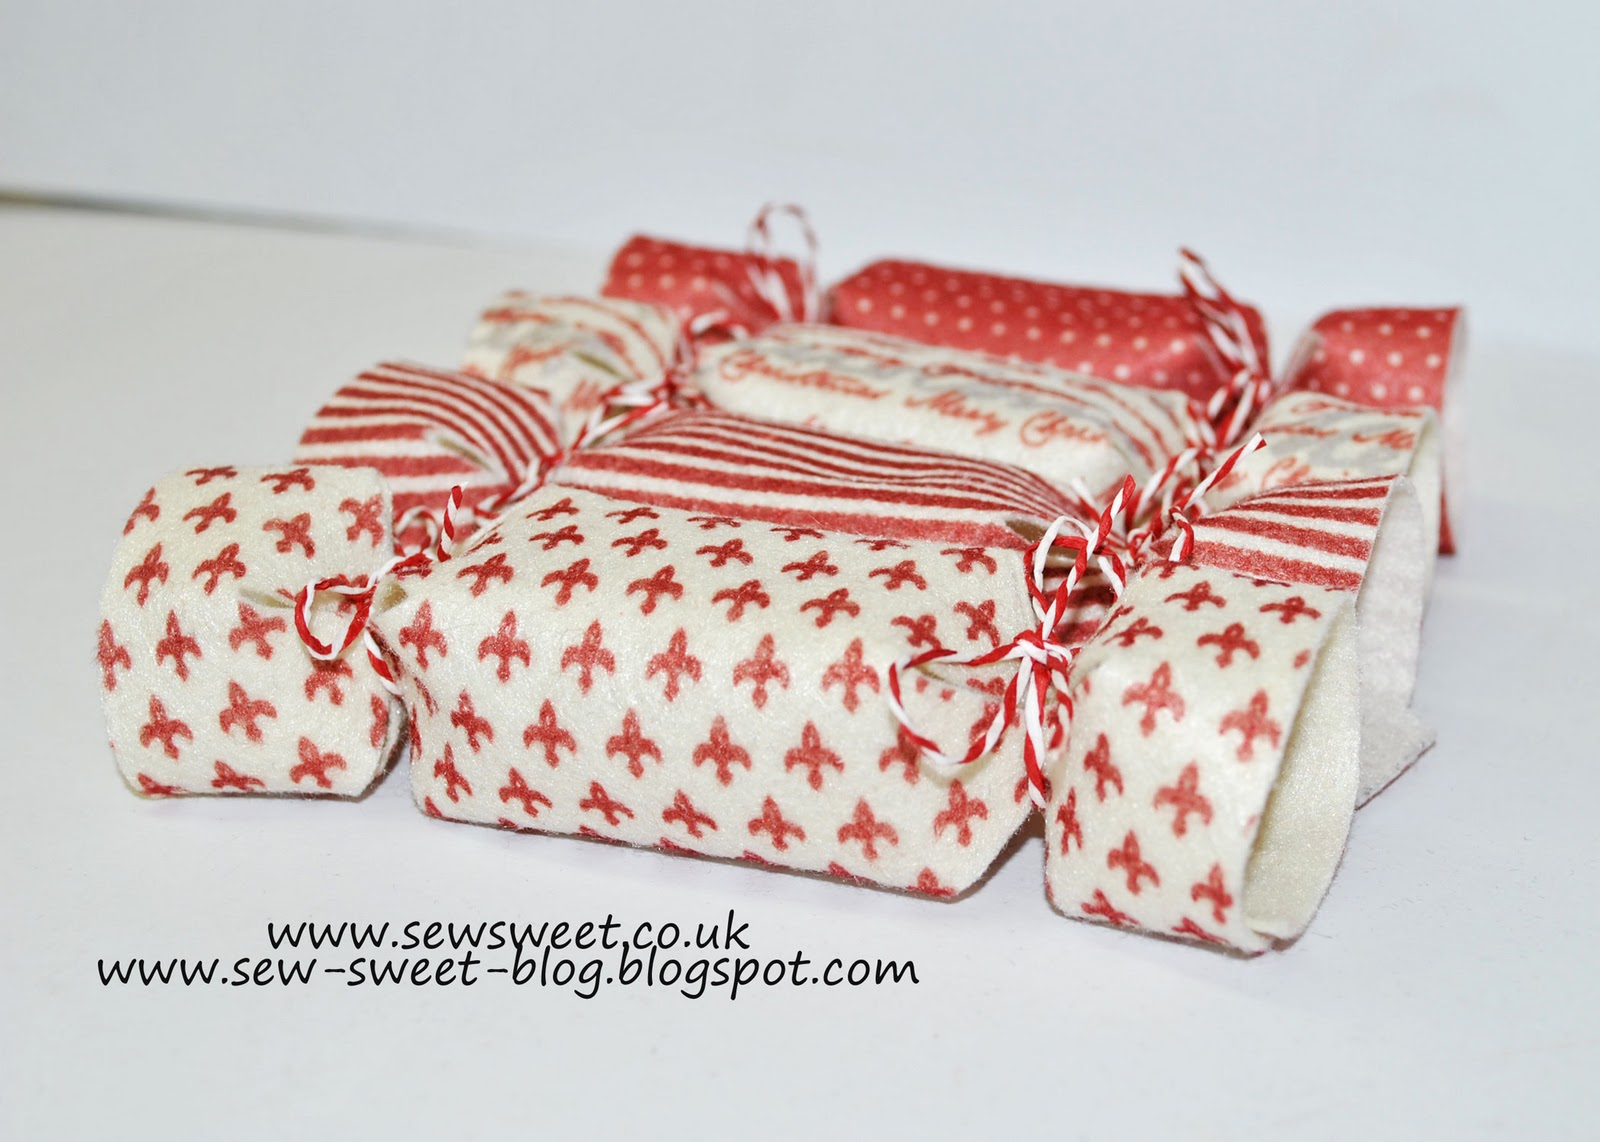 Sew Sweet: Felt Christmas Crackers Tutorial